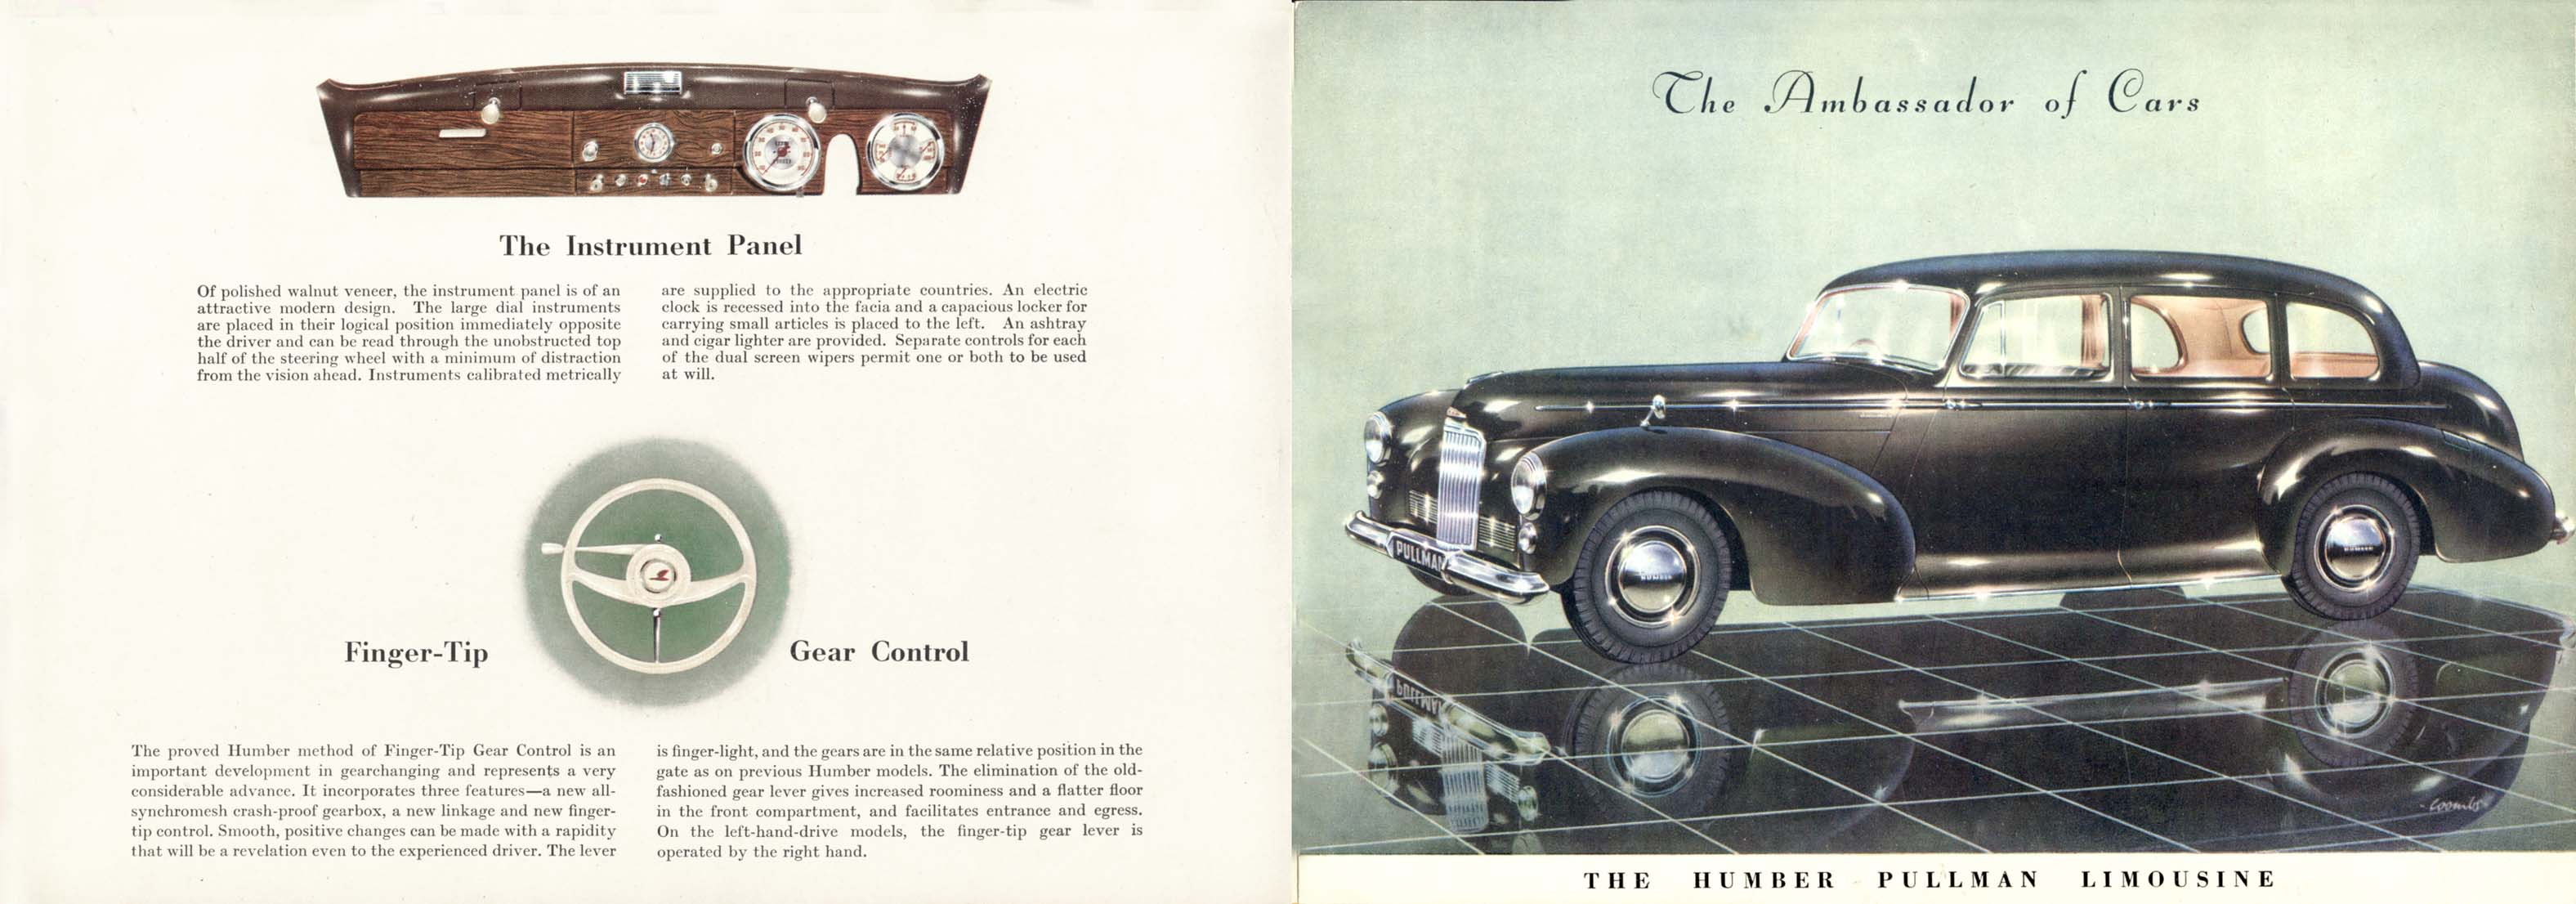 1948 Humber Pullman brochure